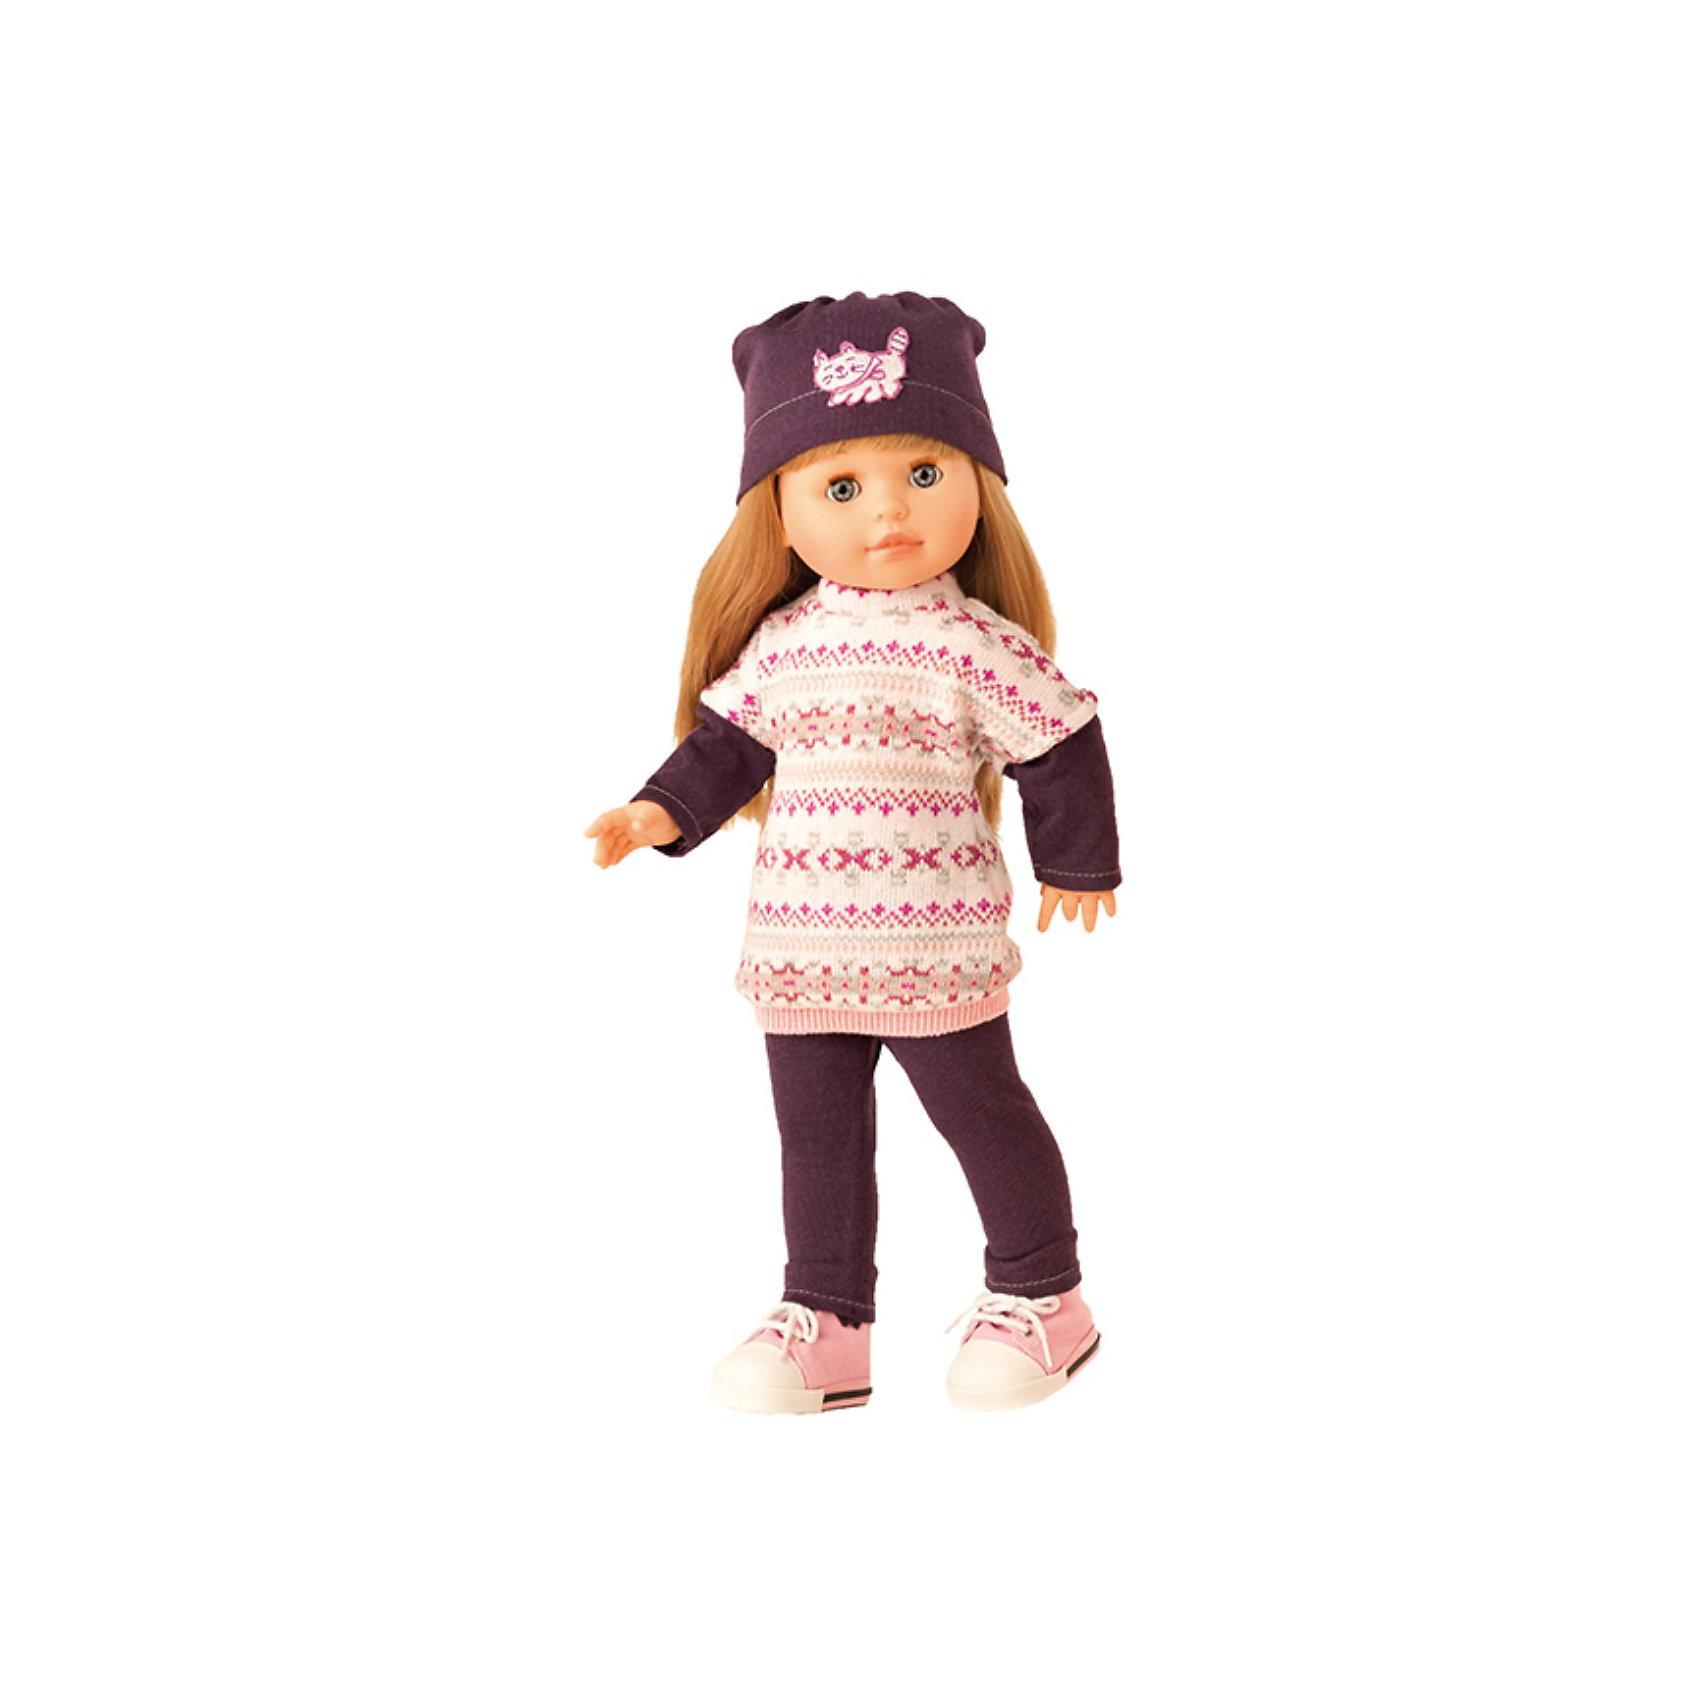 Paola Reina Кукла Маша, 40 см, Paola Reina paola reina пупс без одежды 22 см 31019